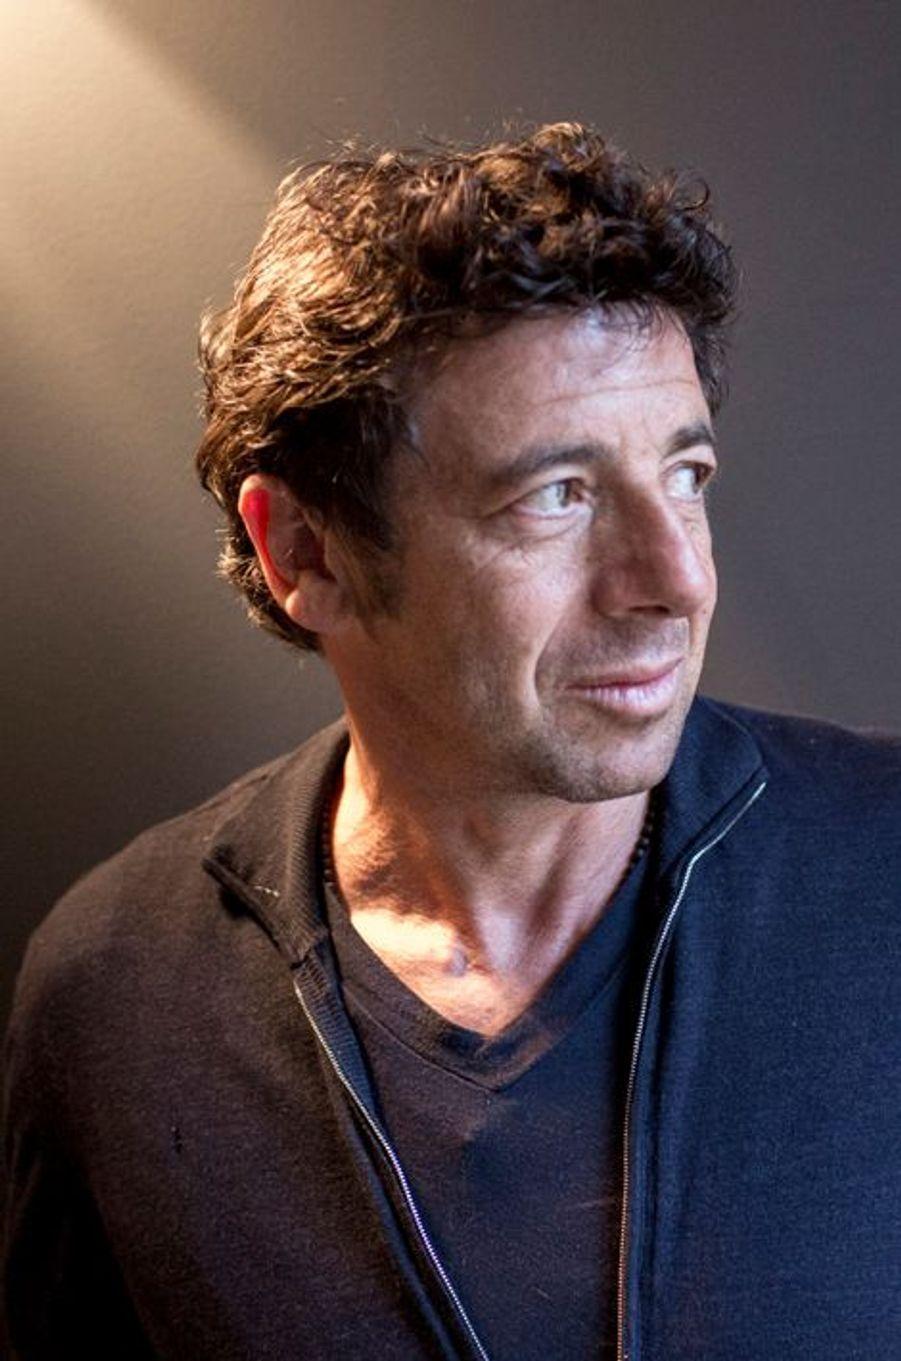 Patrick Bruel à Avignon le 19 mars 2014.